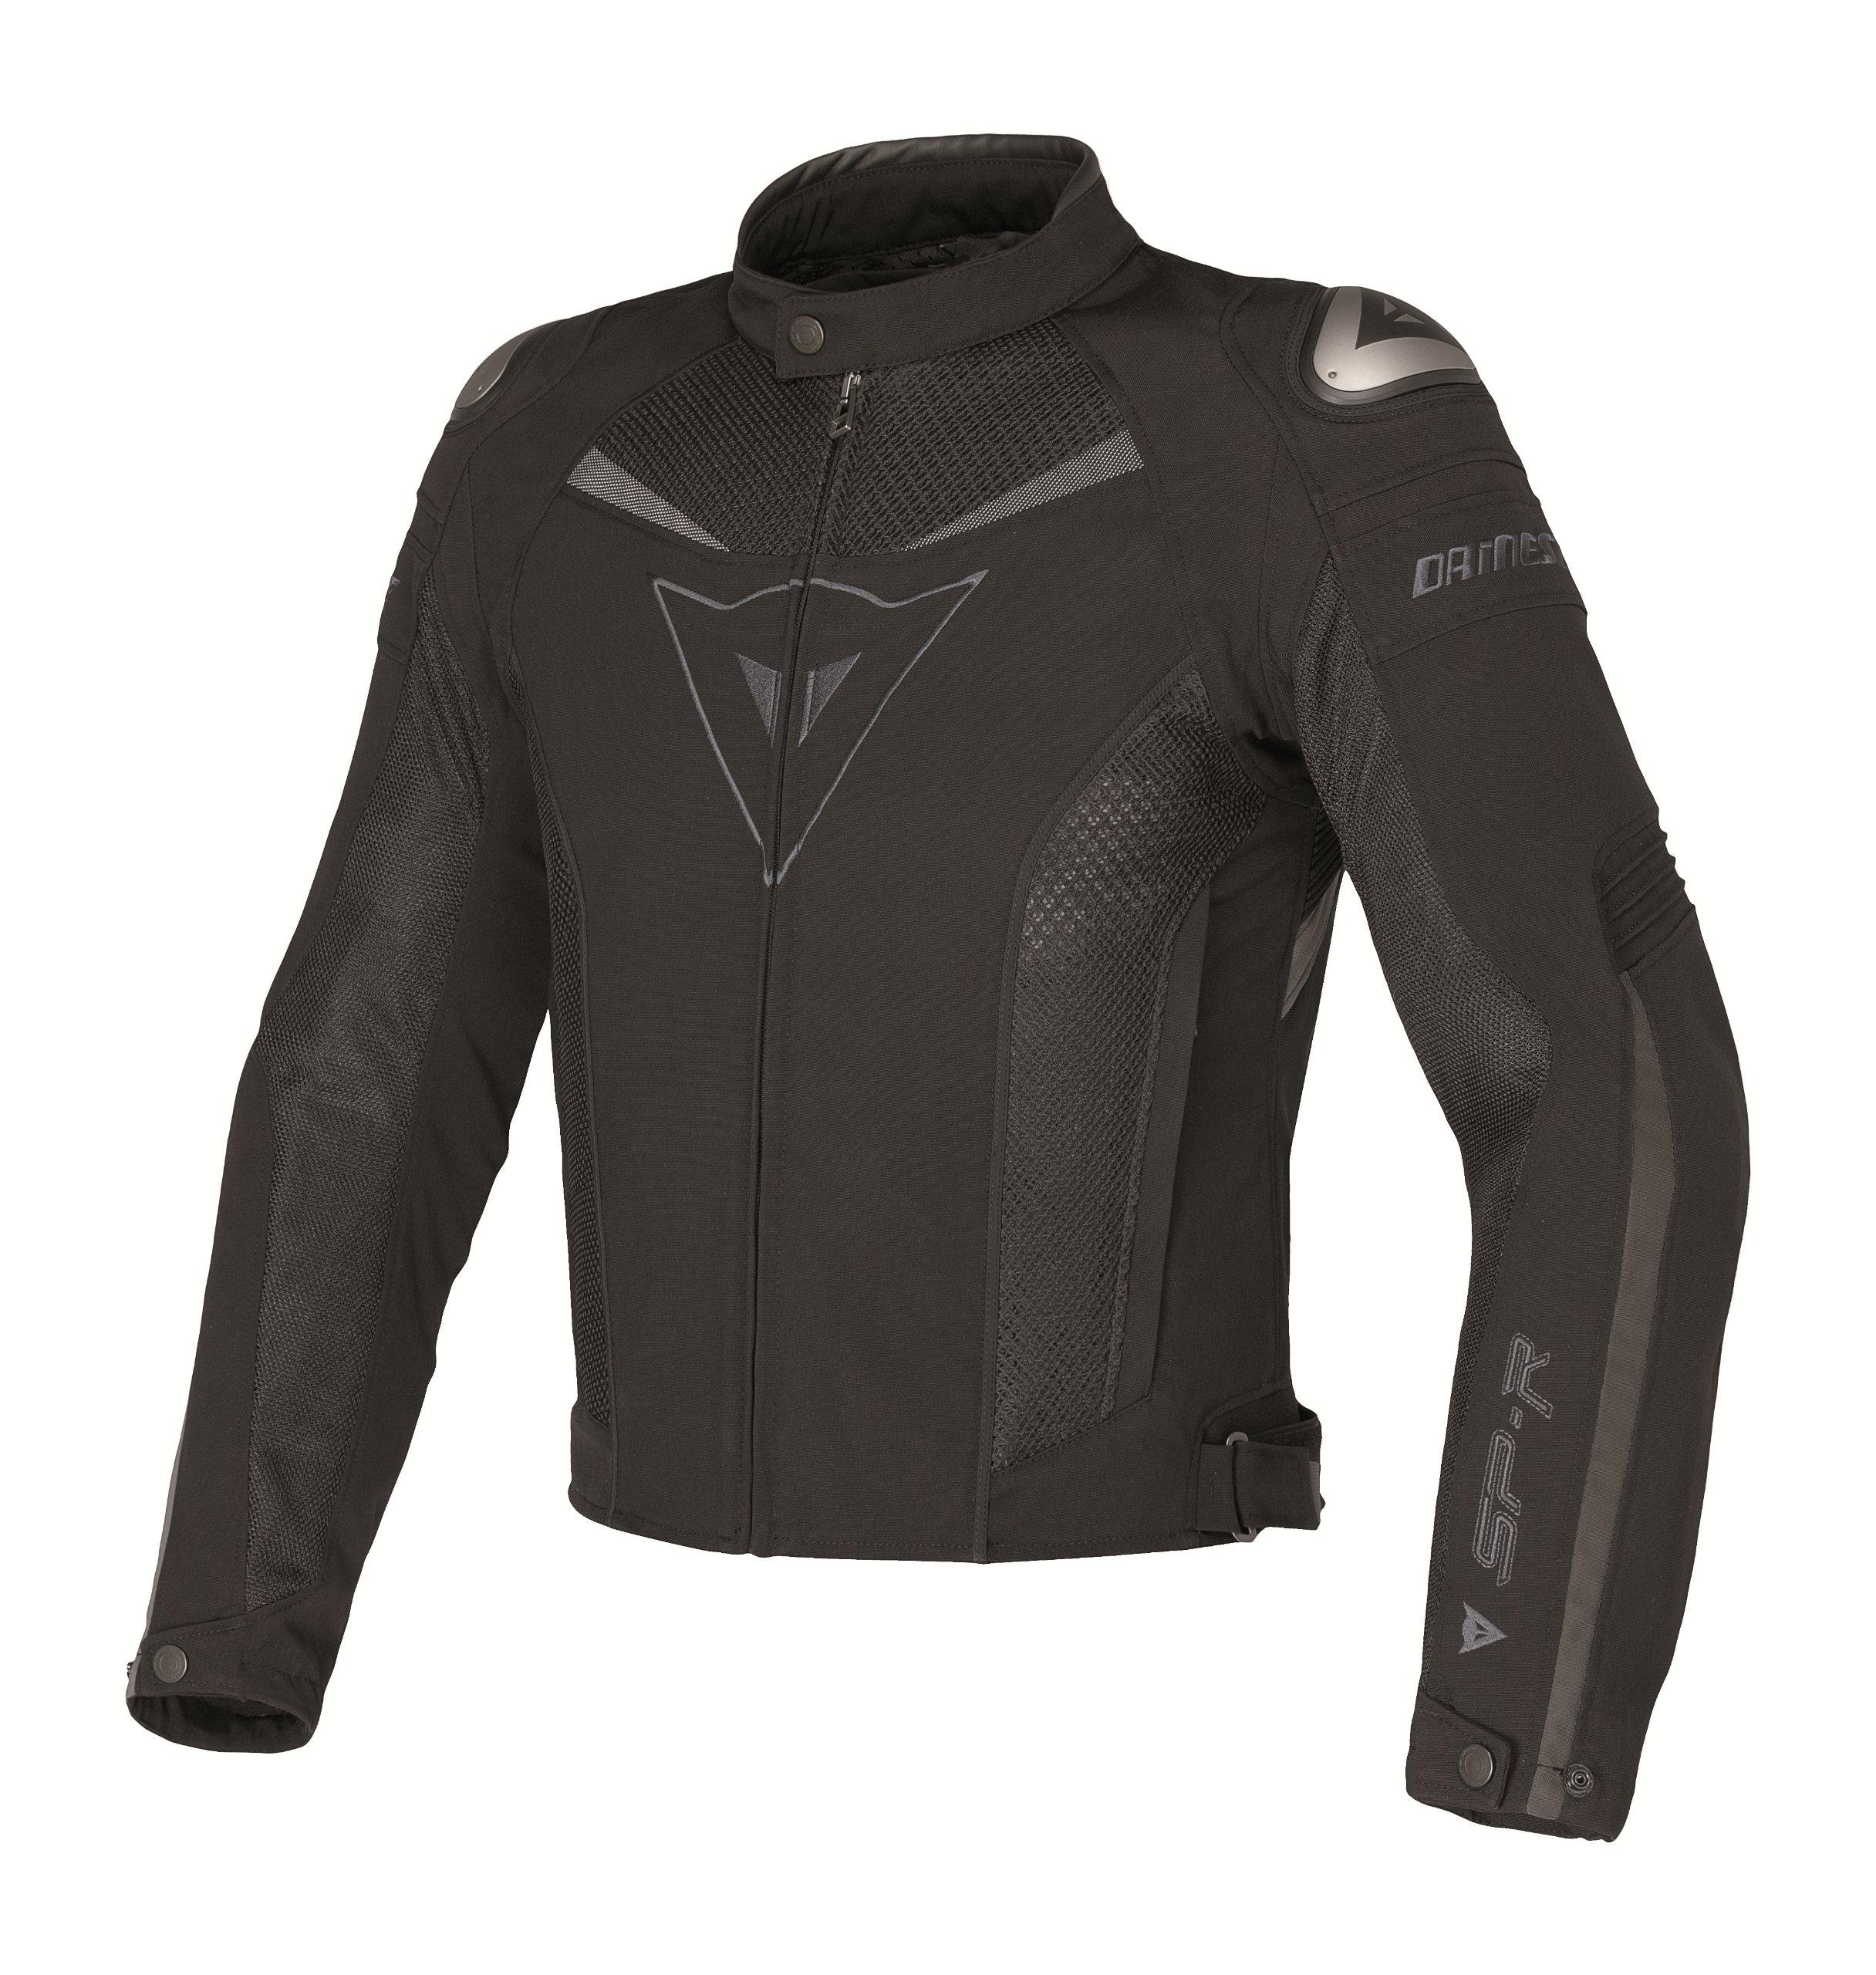 Dainese Super Speed Tex Textile Jacket (Euro 62/US 52, Black/Black/Dark-Gull-Gray)